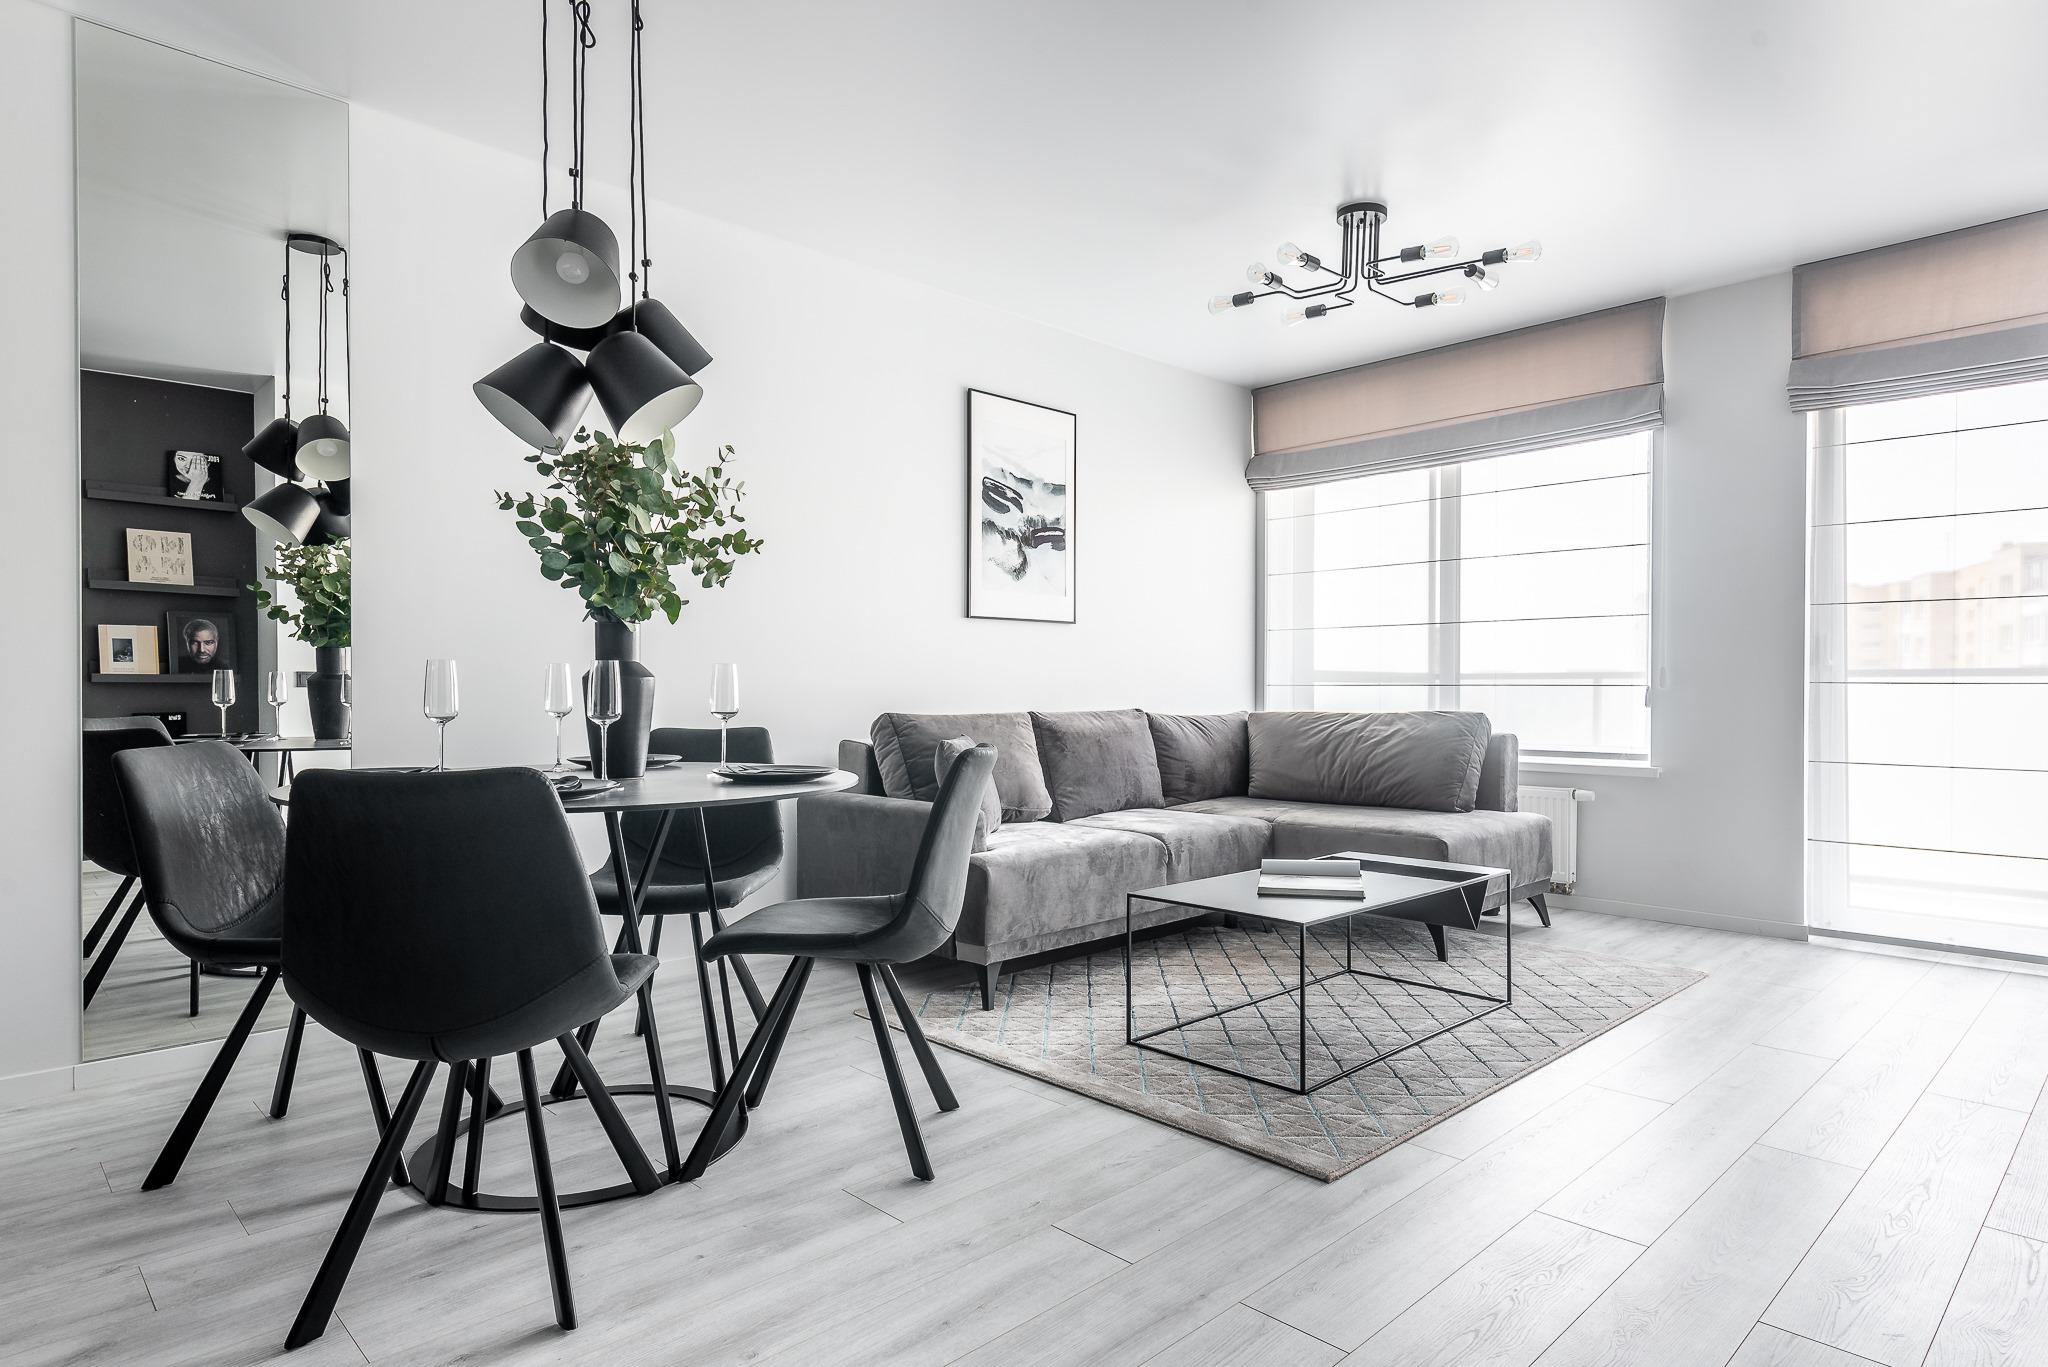 Pilka spalva 2 kambarių buto interjere